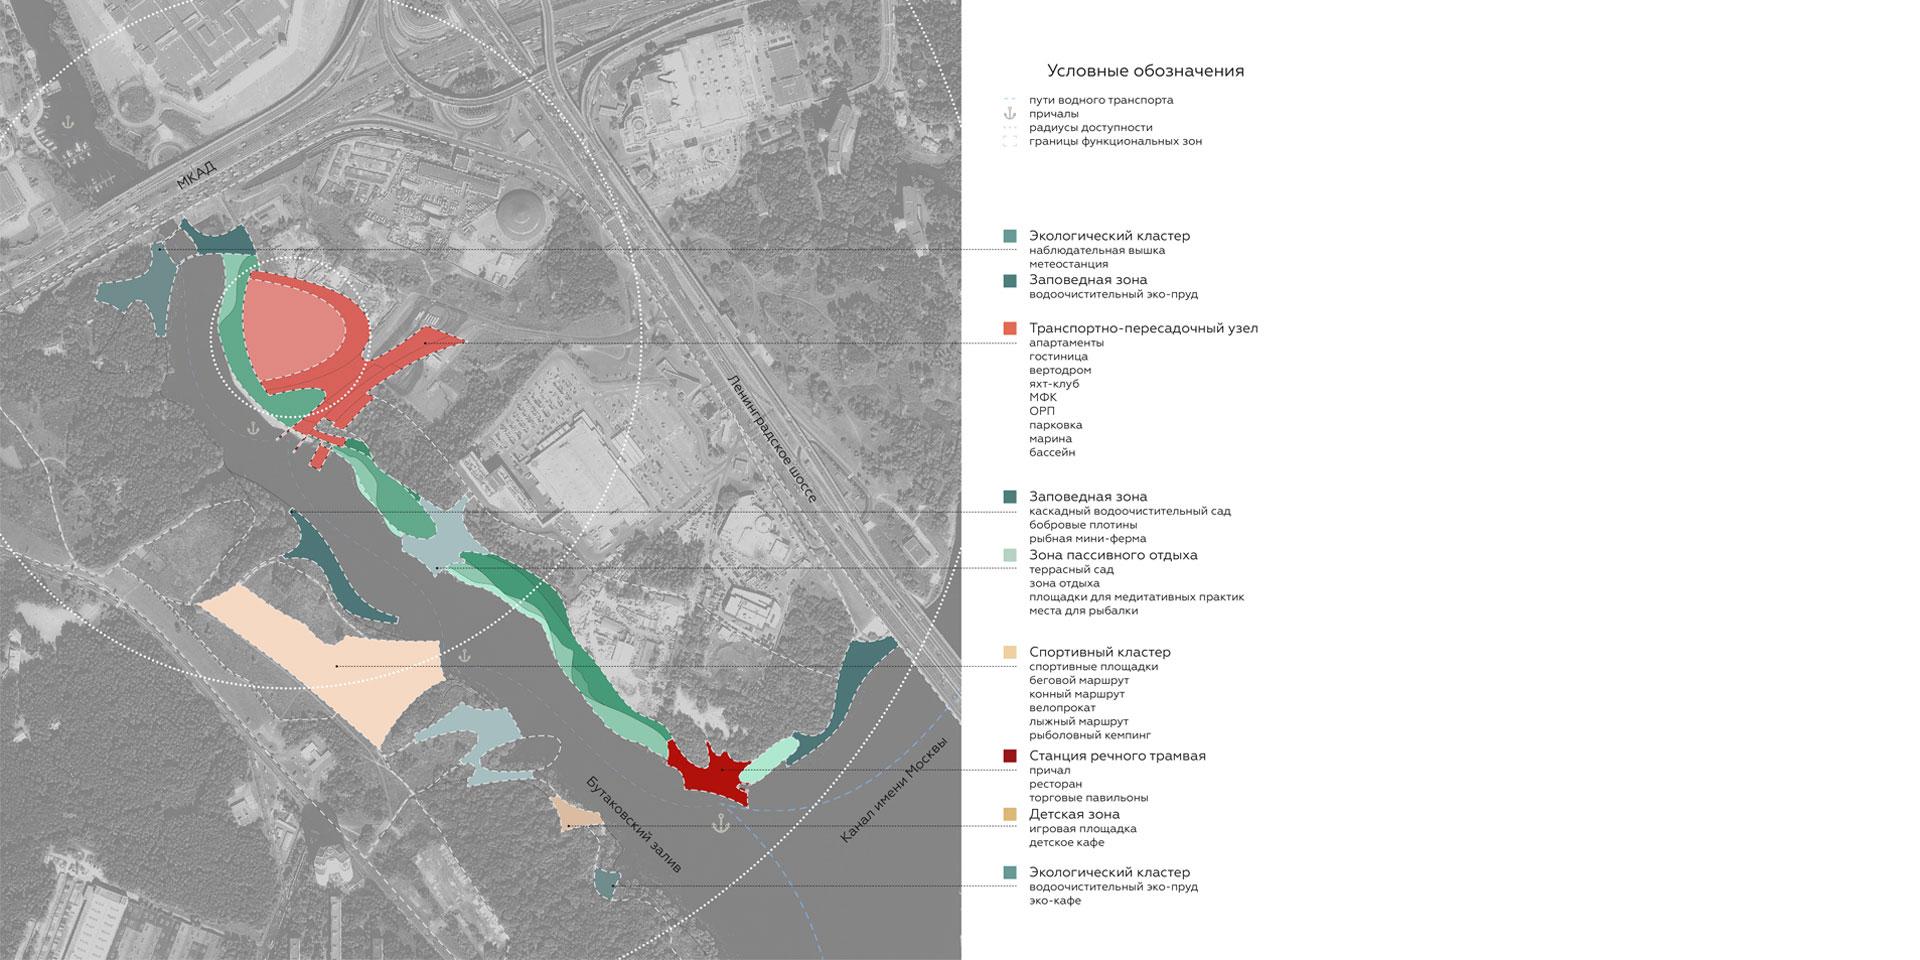 Leningradskoye Highway Multimodal Transport Hub